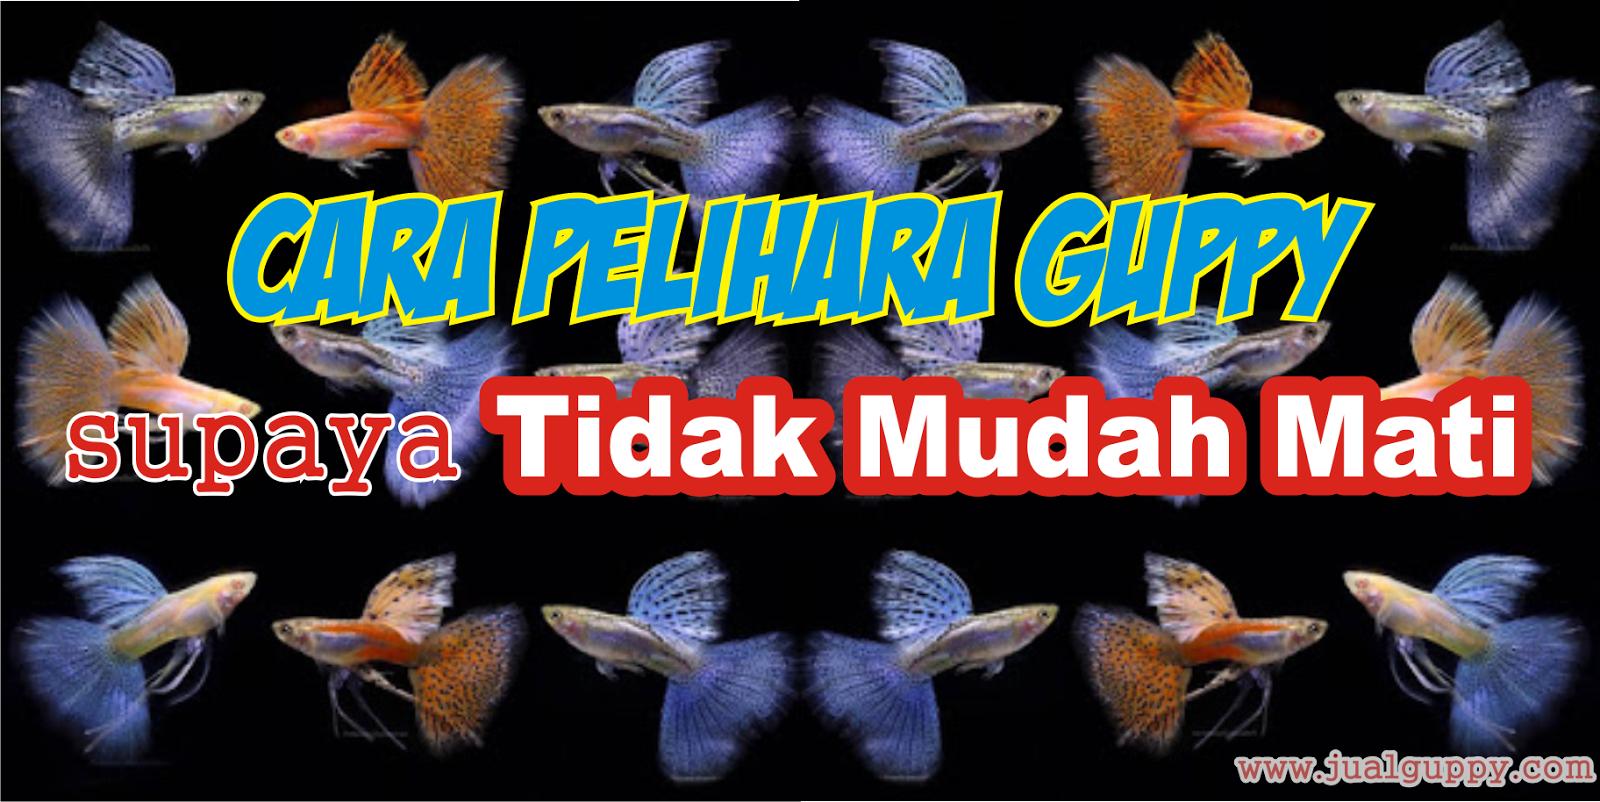 Cara Pelihara Guppy Supaya Tidak Mudah Mati Sale Guppy Fish Indonesia